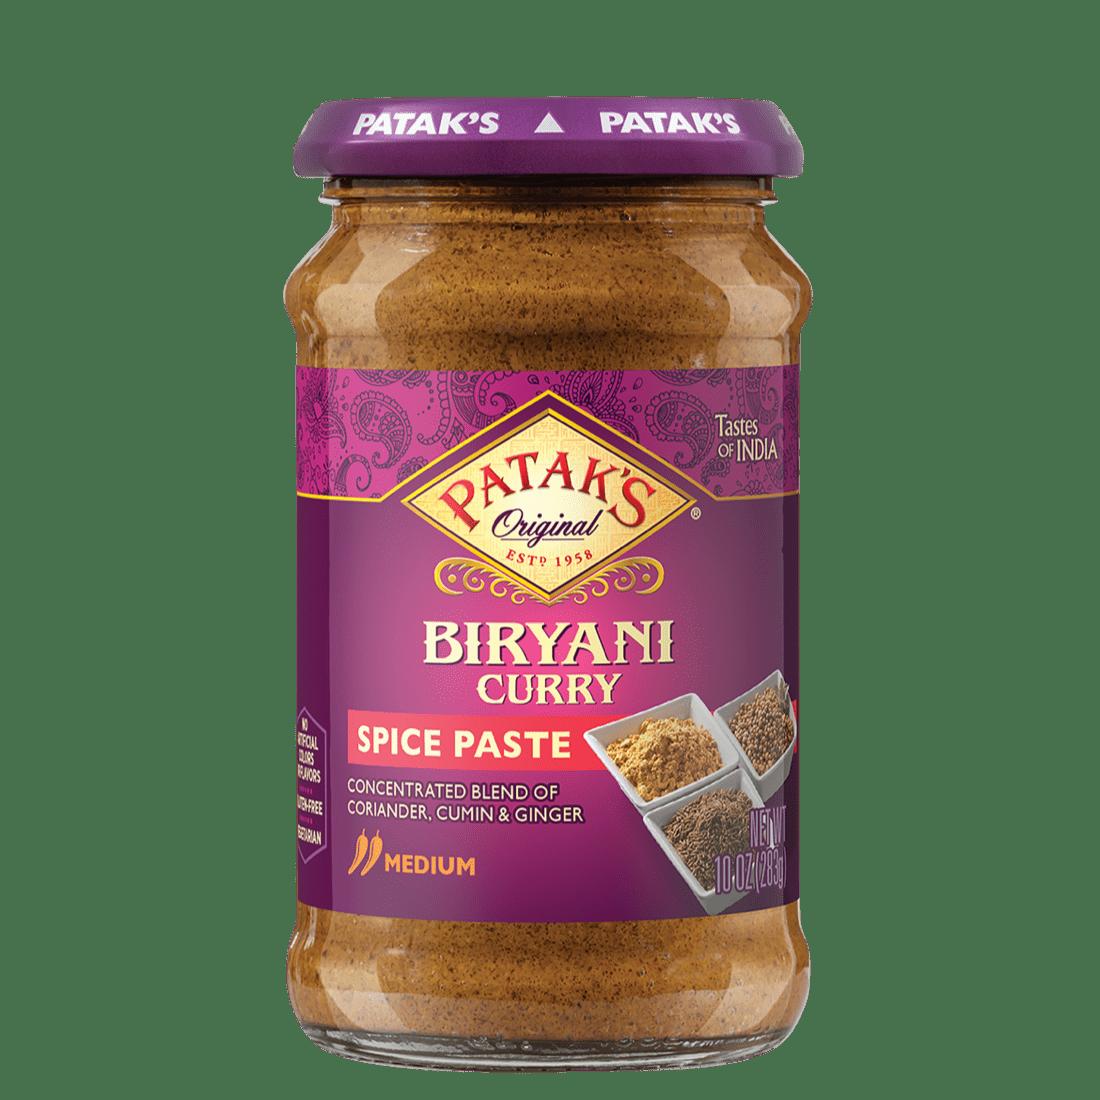 Biryani curry spice paste 2x